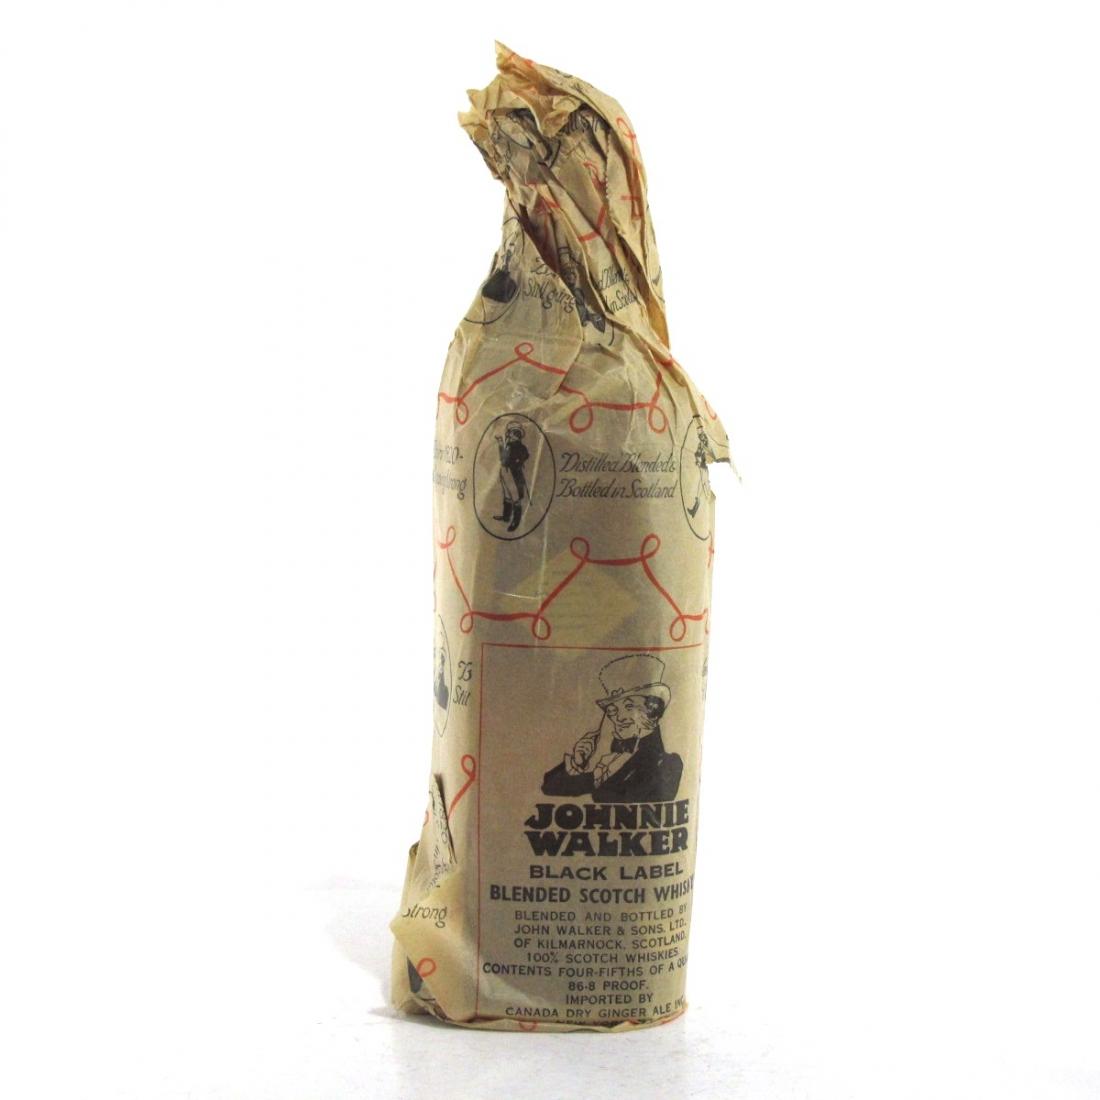 Johnnie Walker Black Label 1950s / US Import